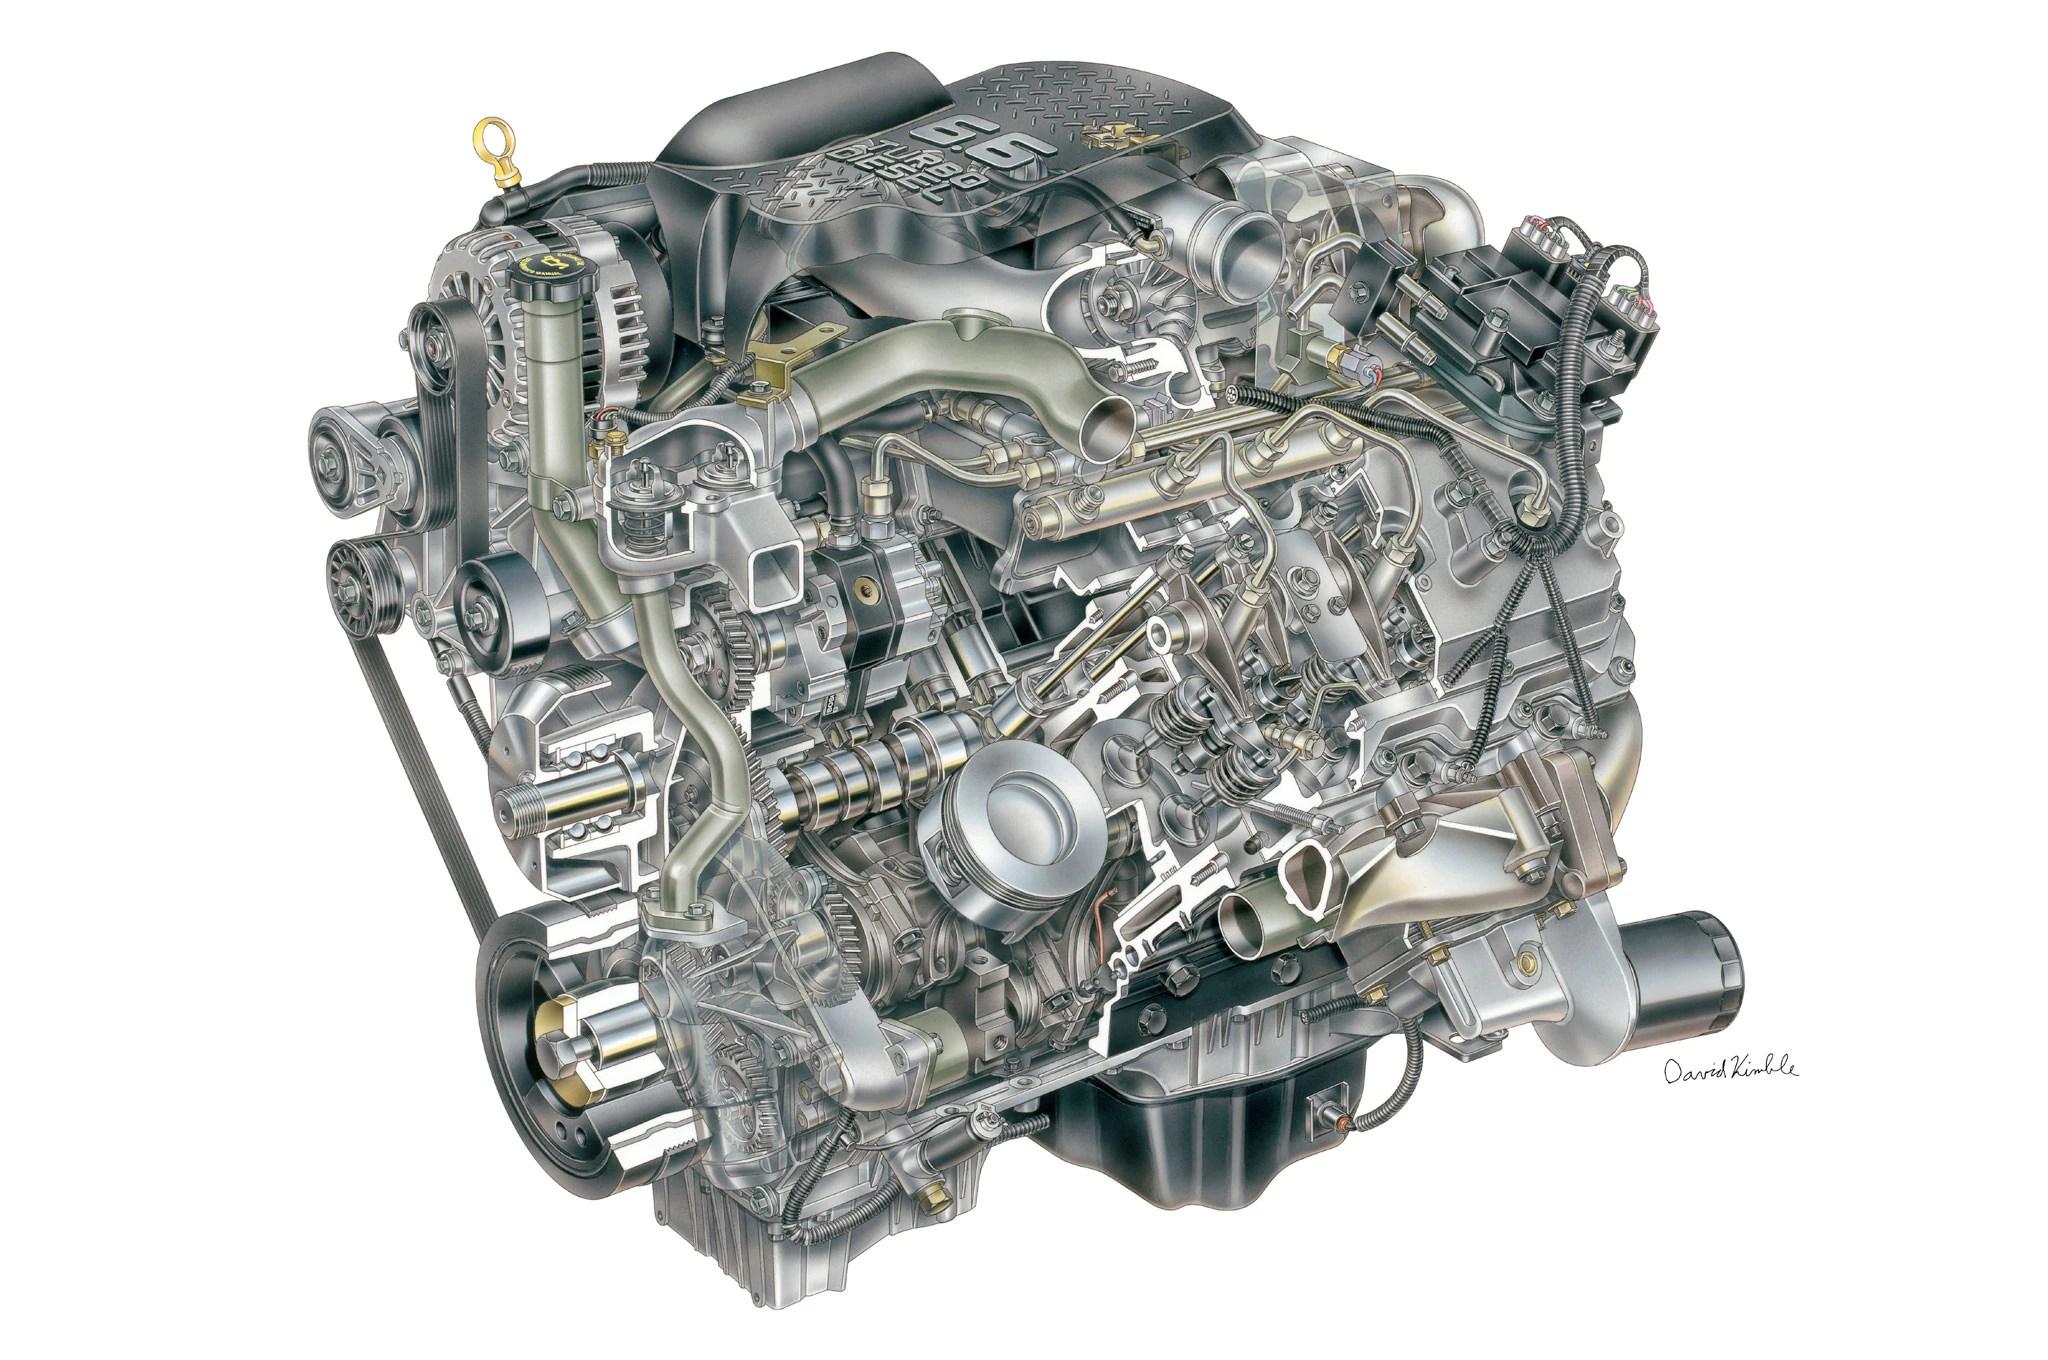 small resolution of engine diagram 05 6 6 duramax